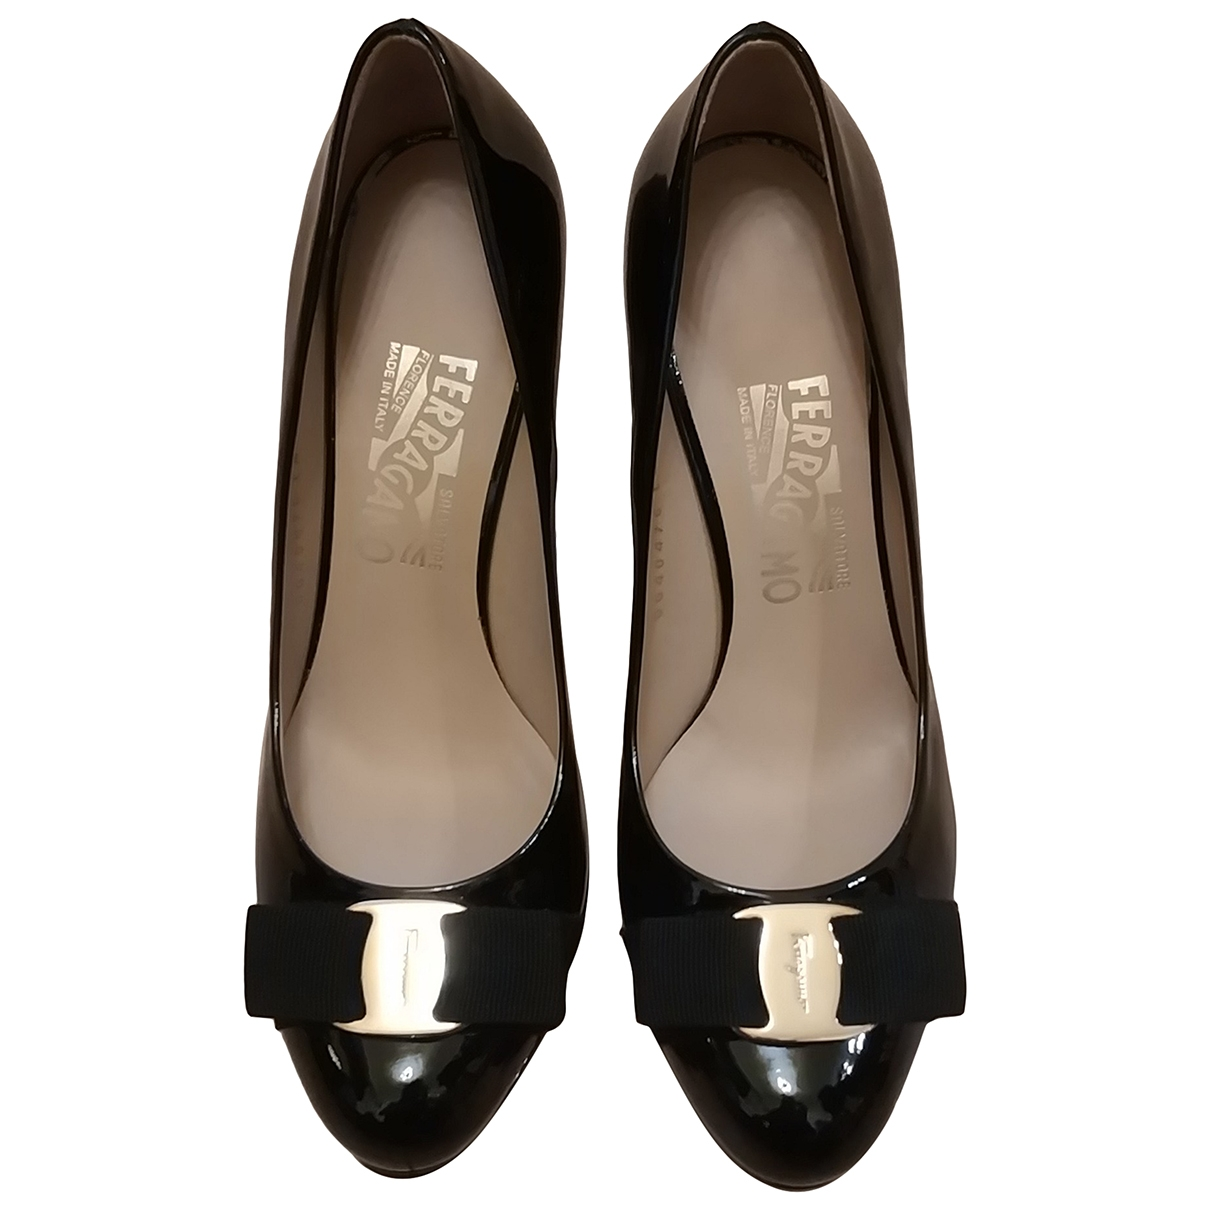 Salvatore Ferragamo \N Black Patent leather Heels for Women 7 UK